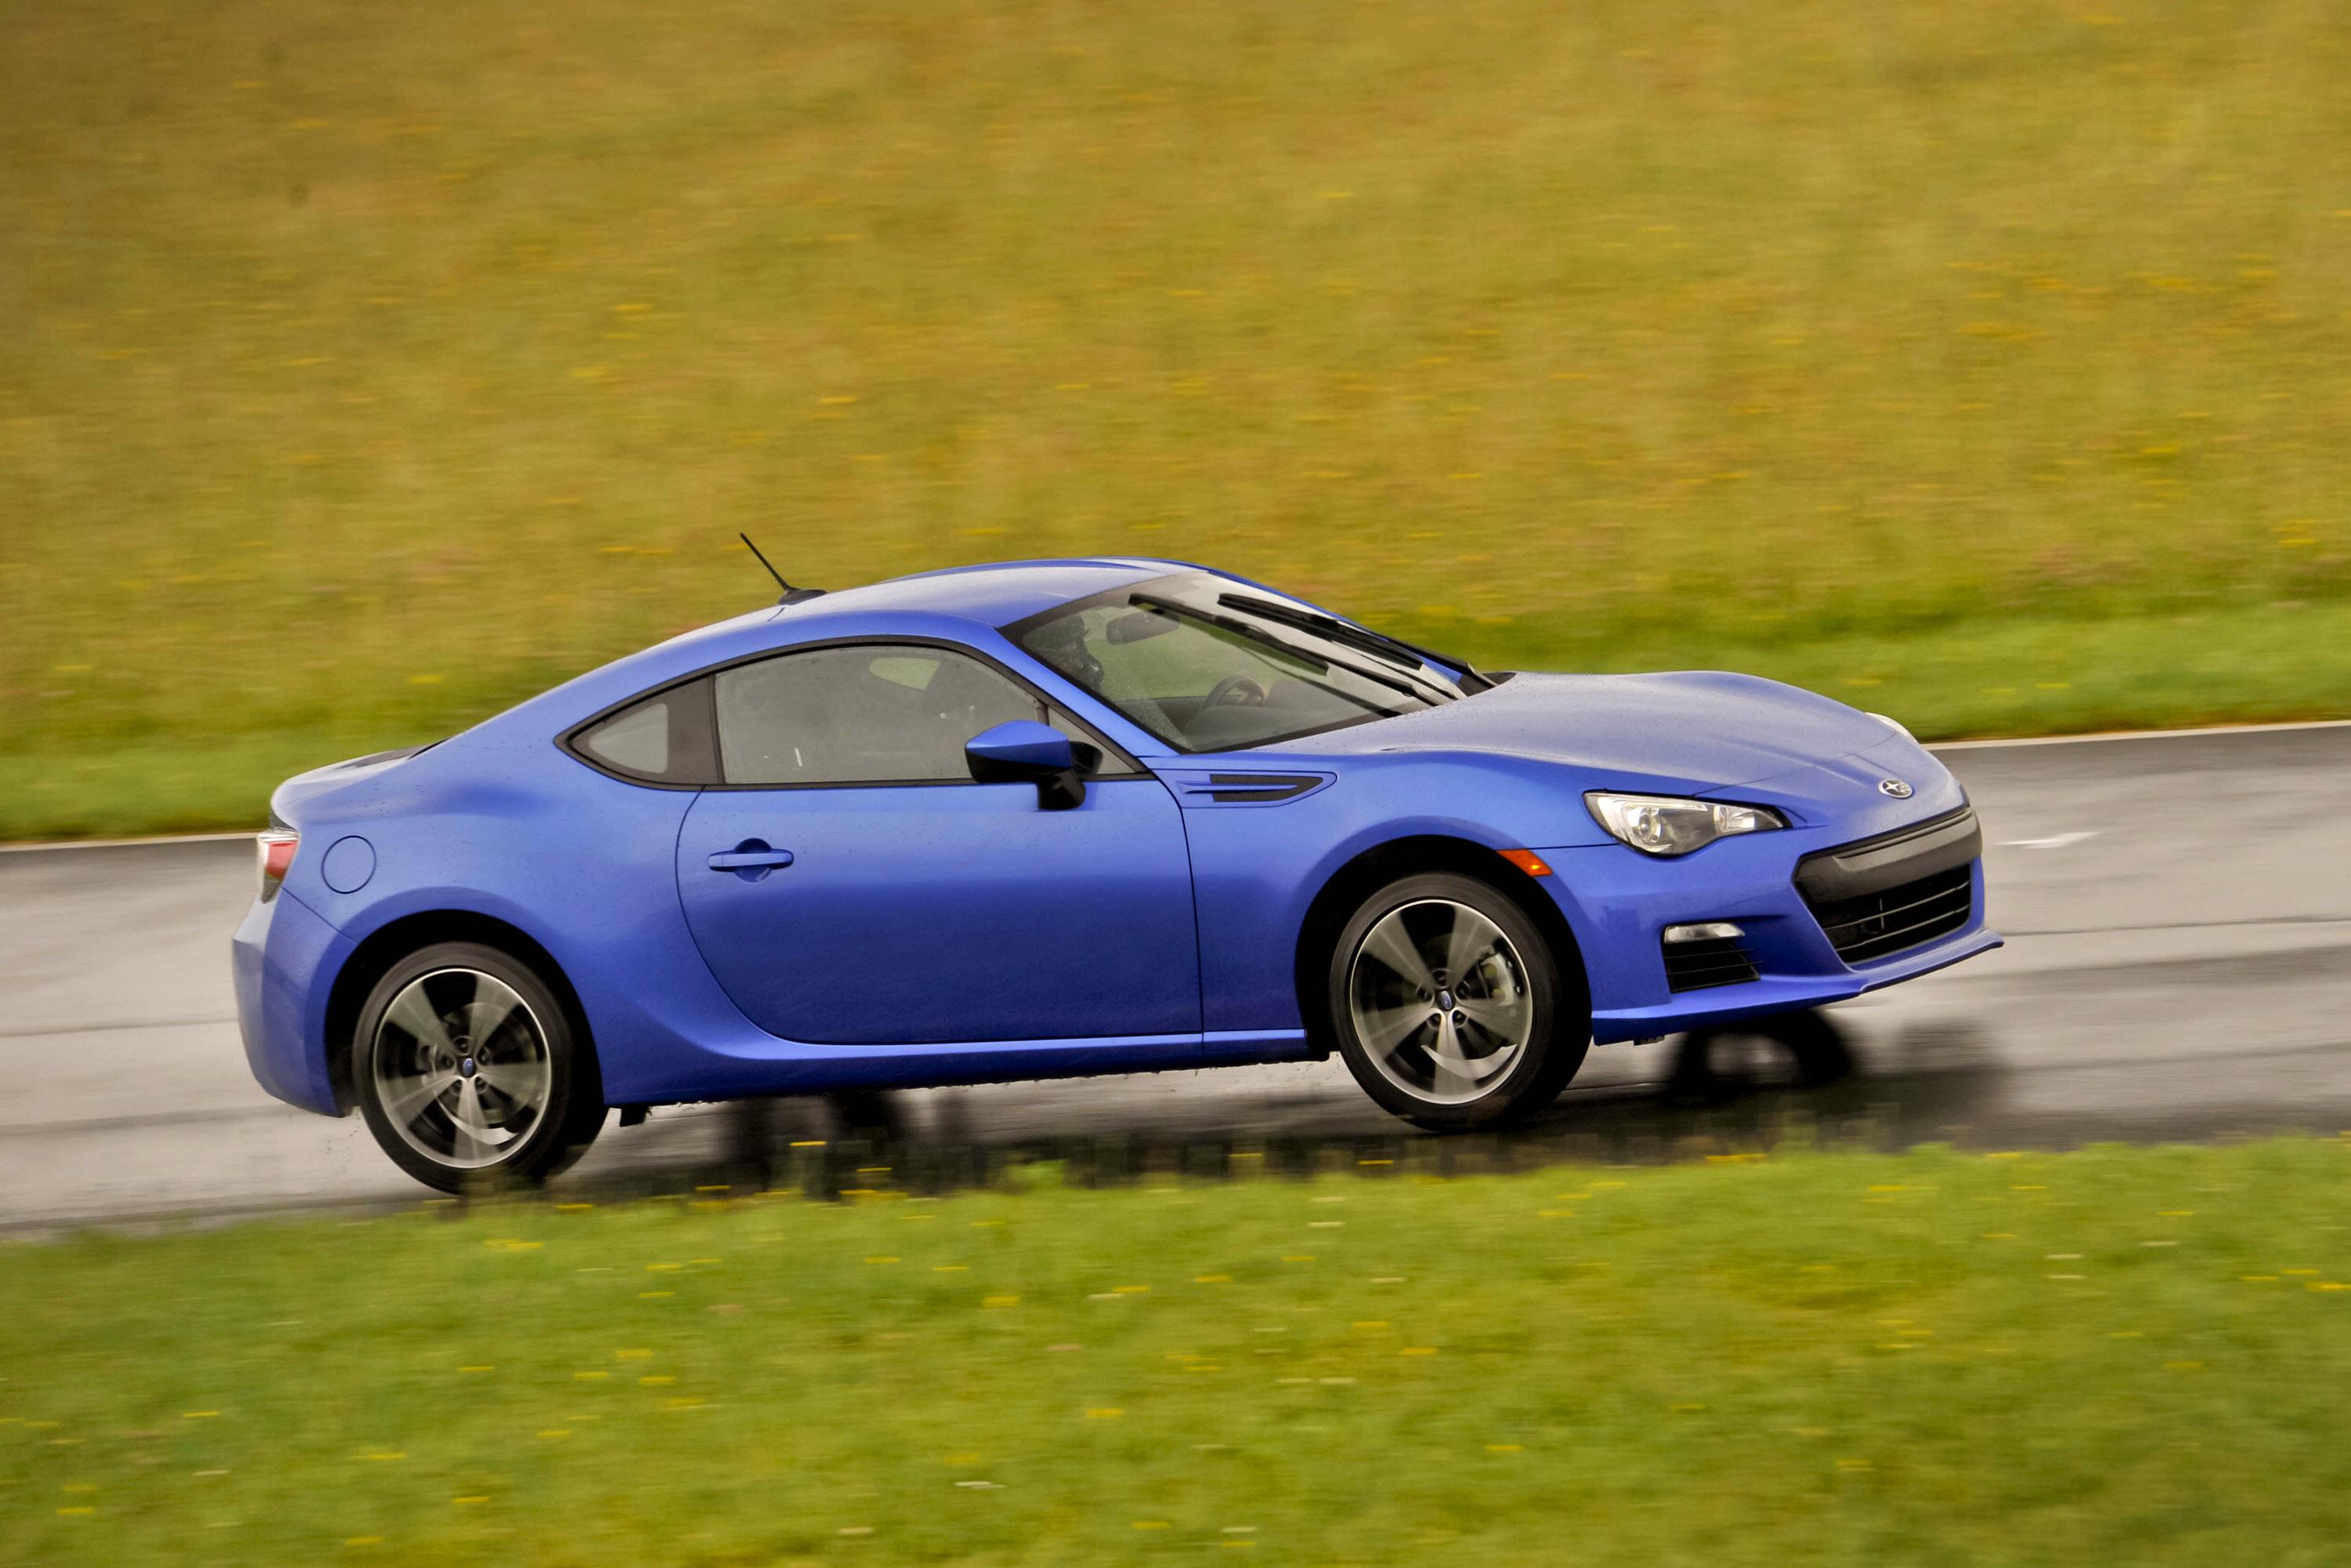 2014 Subaru BRZ - HD Pictures @ carsinvasion.com